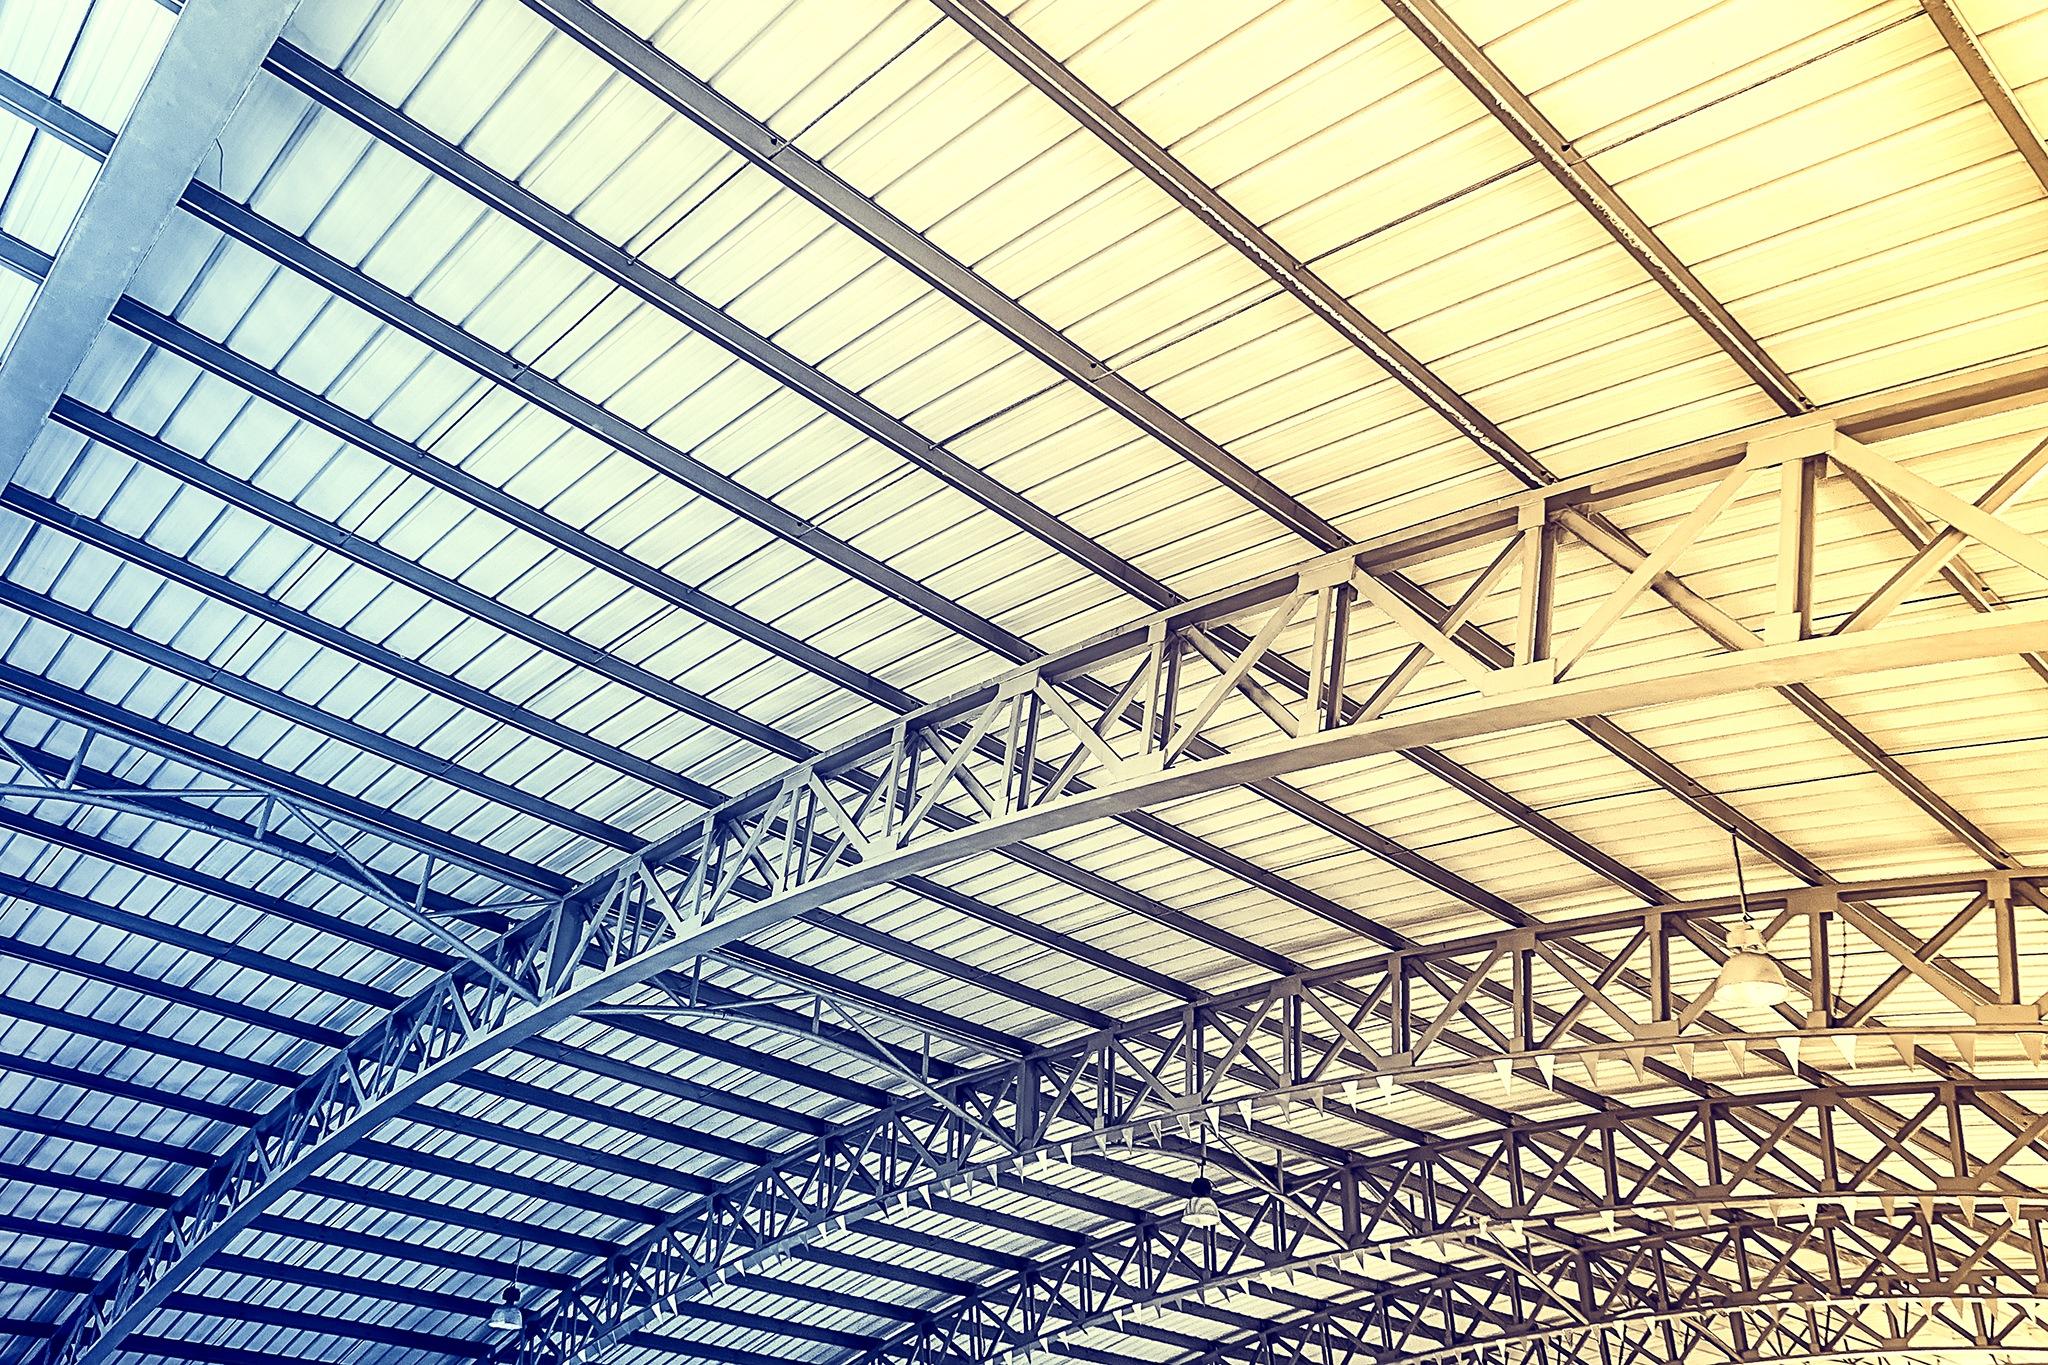 Dome's Structure by Tony Guzman